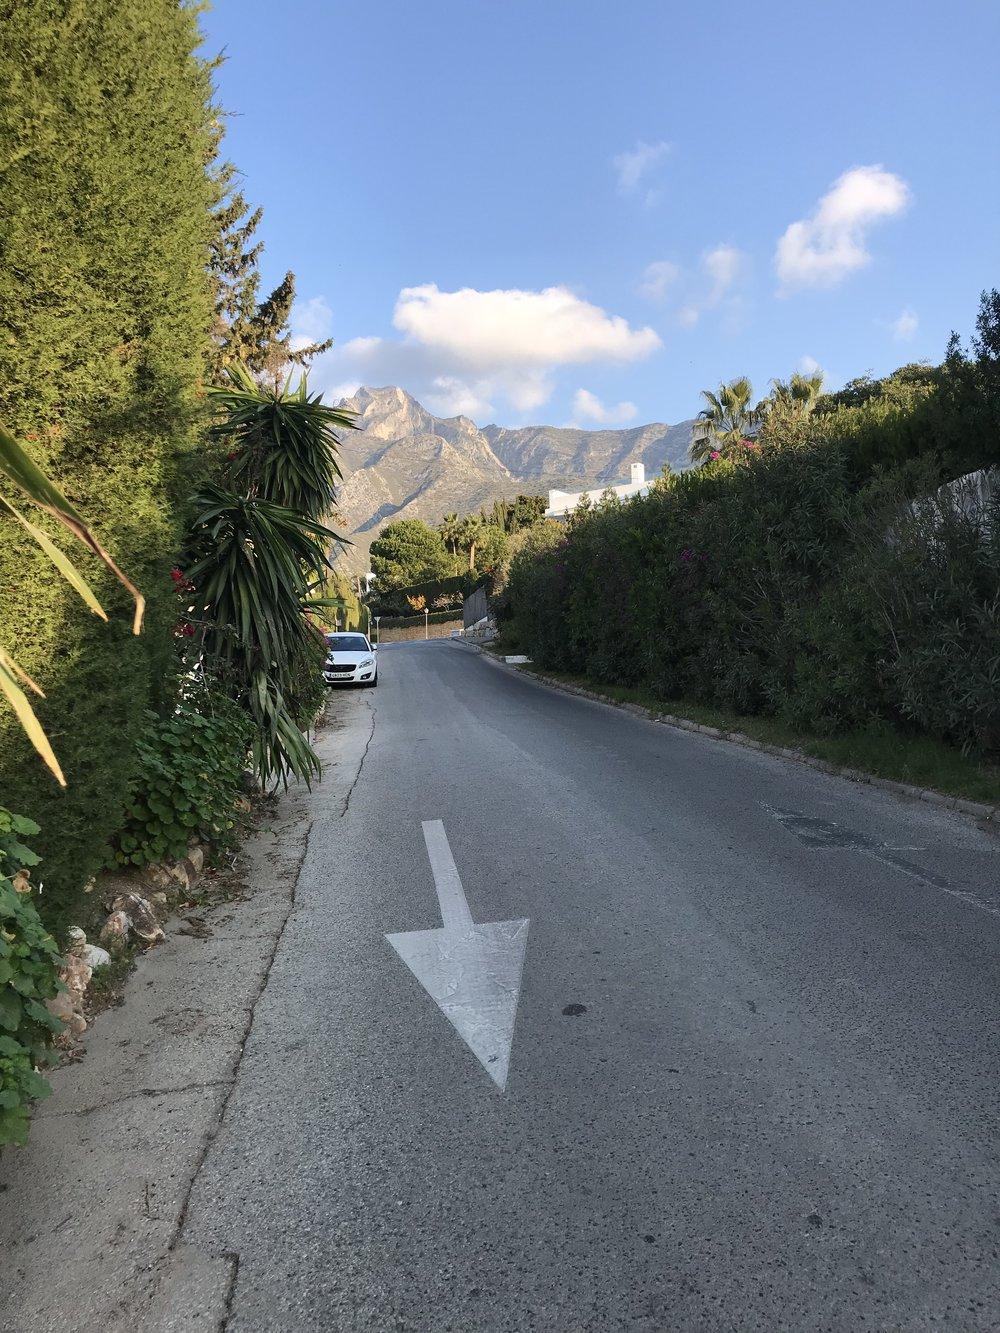 Morning walk in Sierra Blanca, Marbella